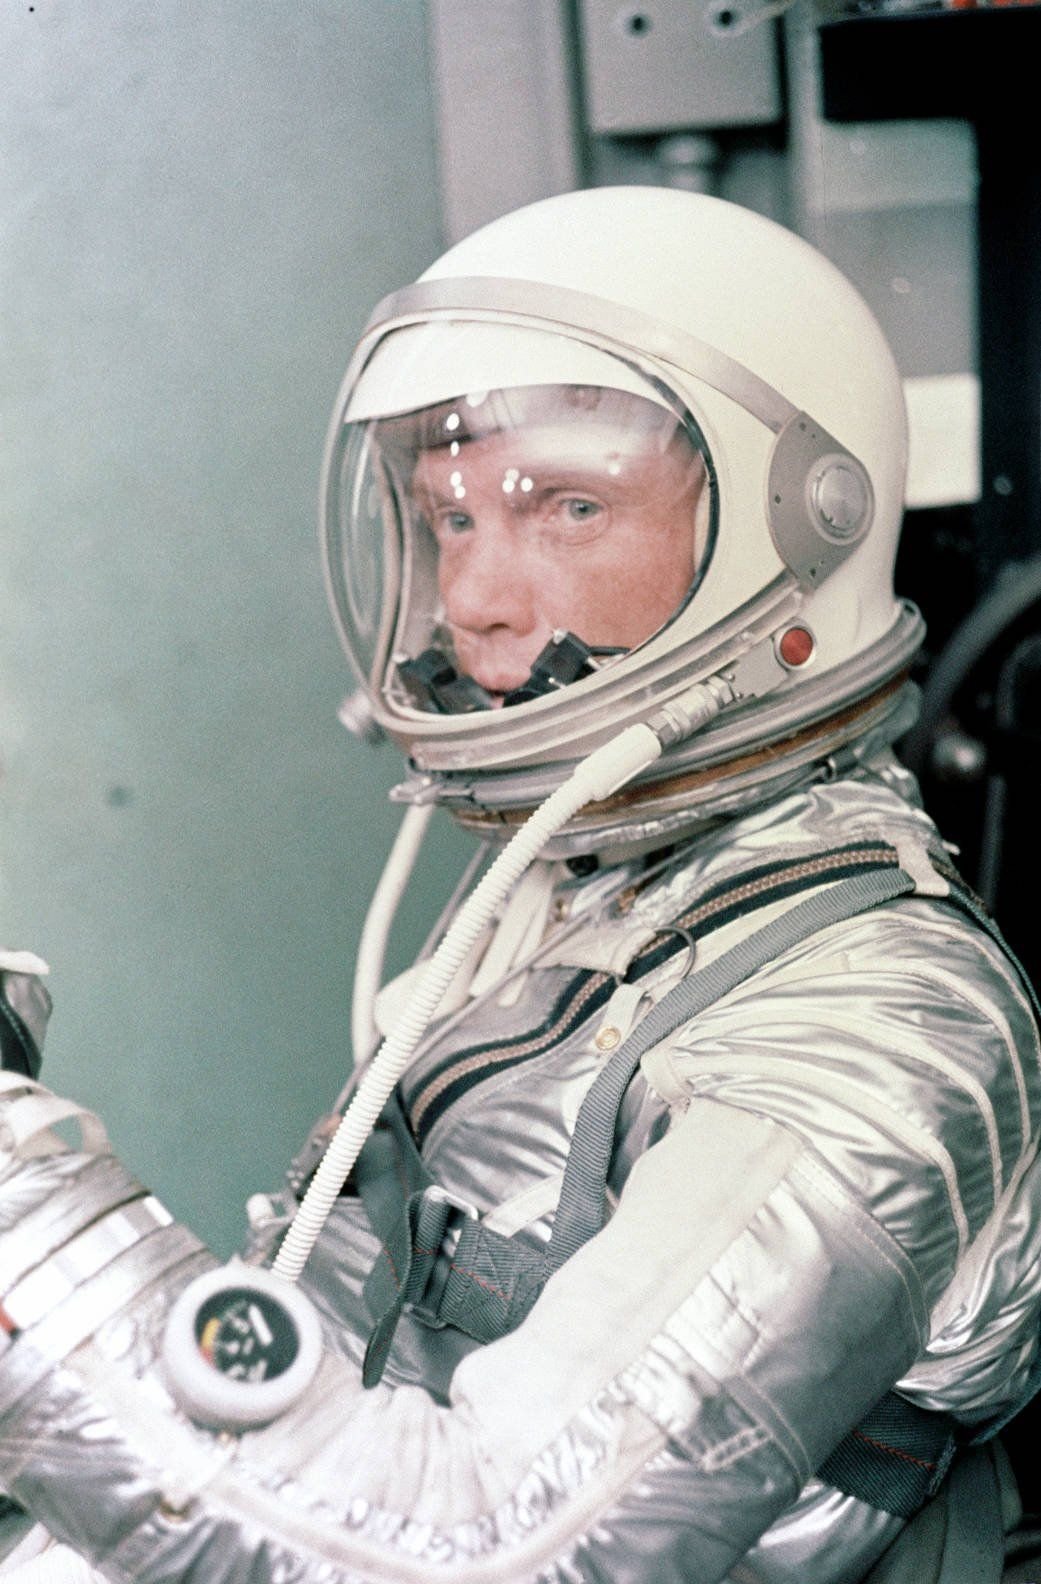 These Photos Captured The Defining Moments Of Decorated Astronaut John Glenn S Life And Career John Glenn Astronaut Project Mercury